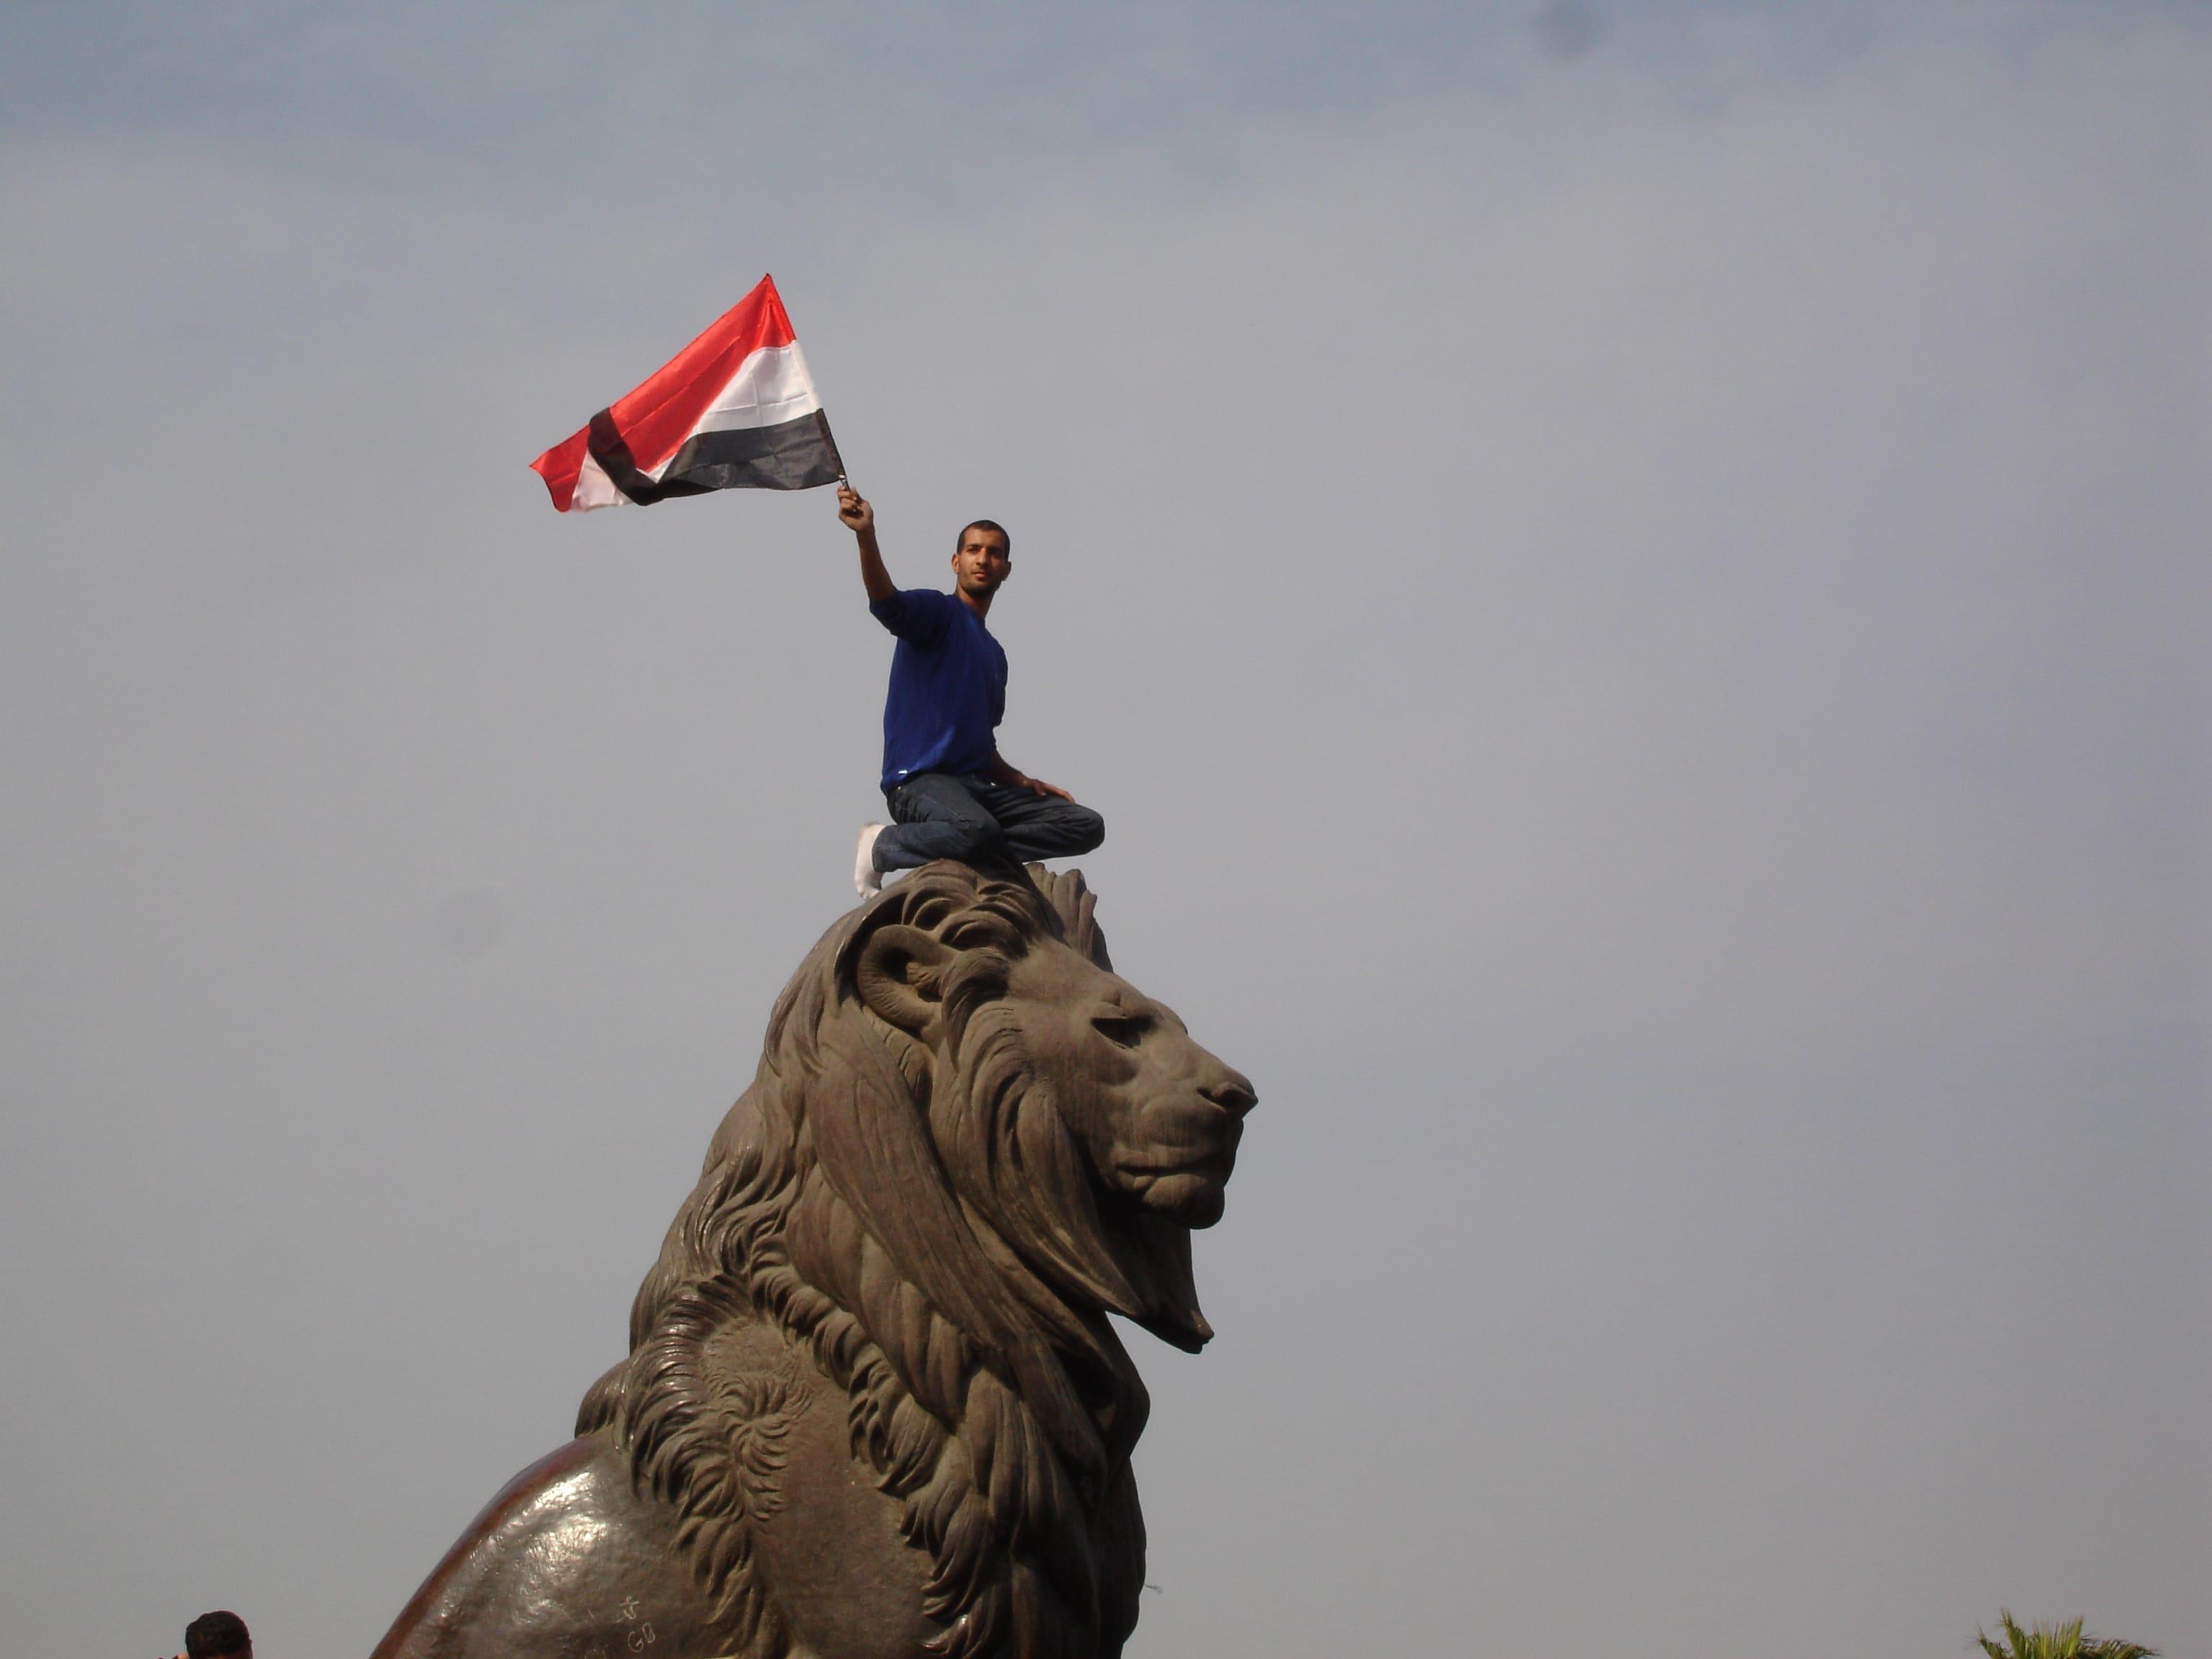 Ties that Bind: The Social Pillars of Arab Authoritarian Regimes